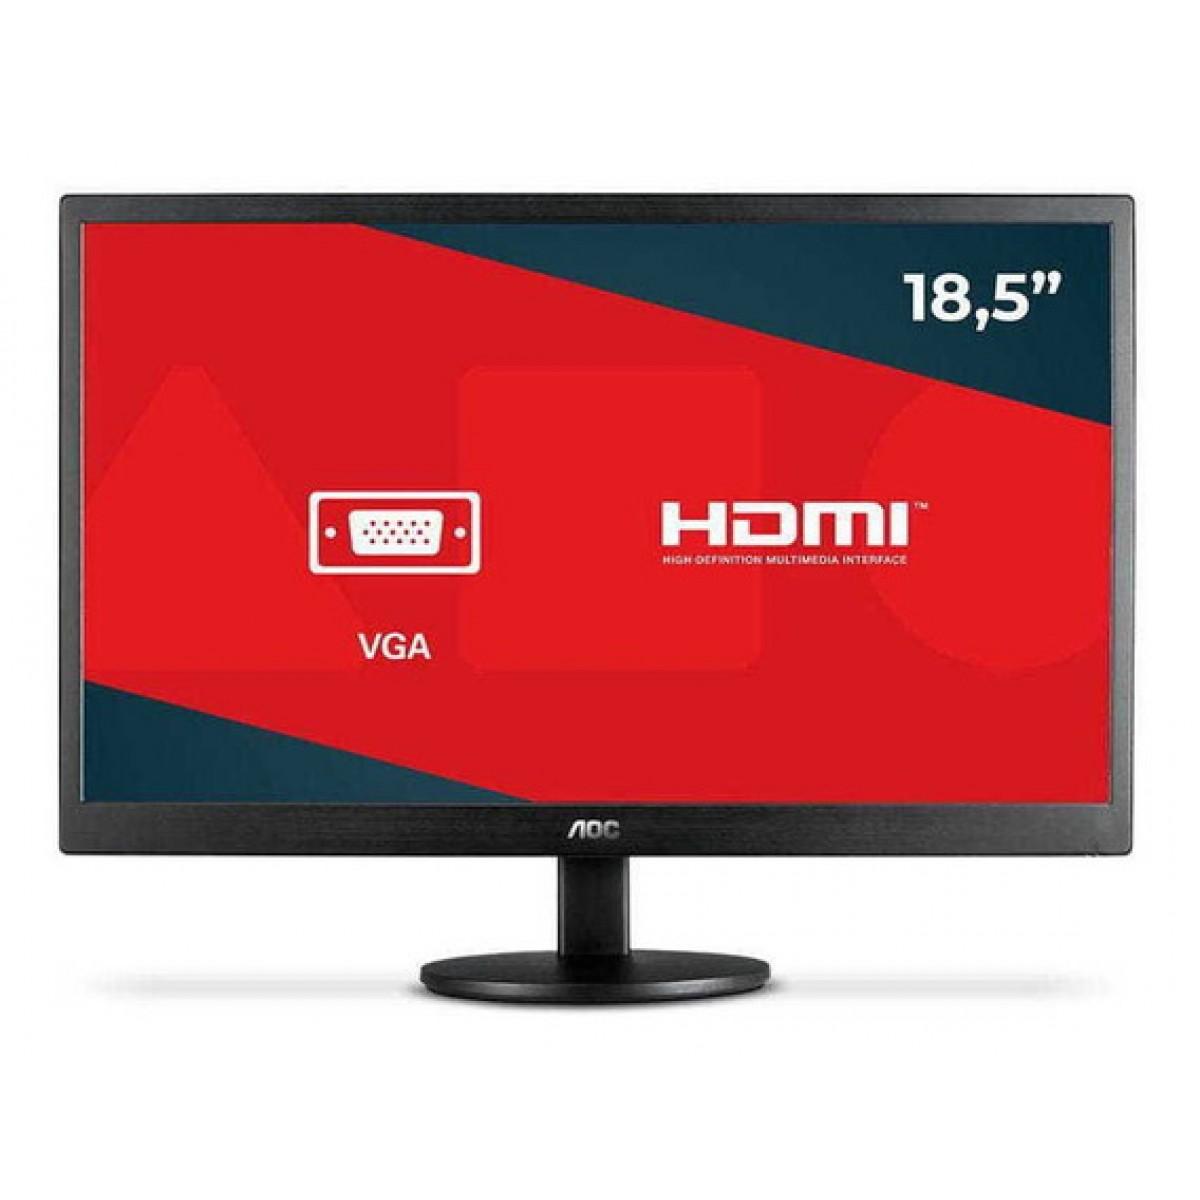 Monitor AOC 18.5 Pol, HD, VGA, HDMI, E970SWHNL